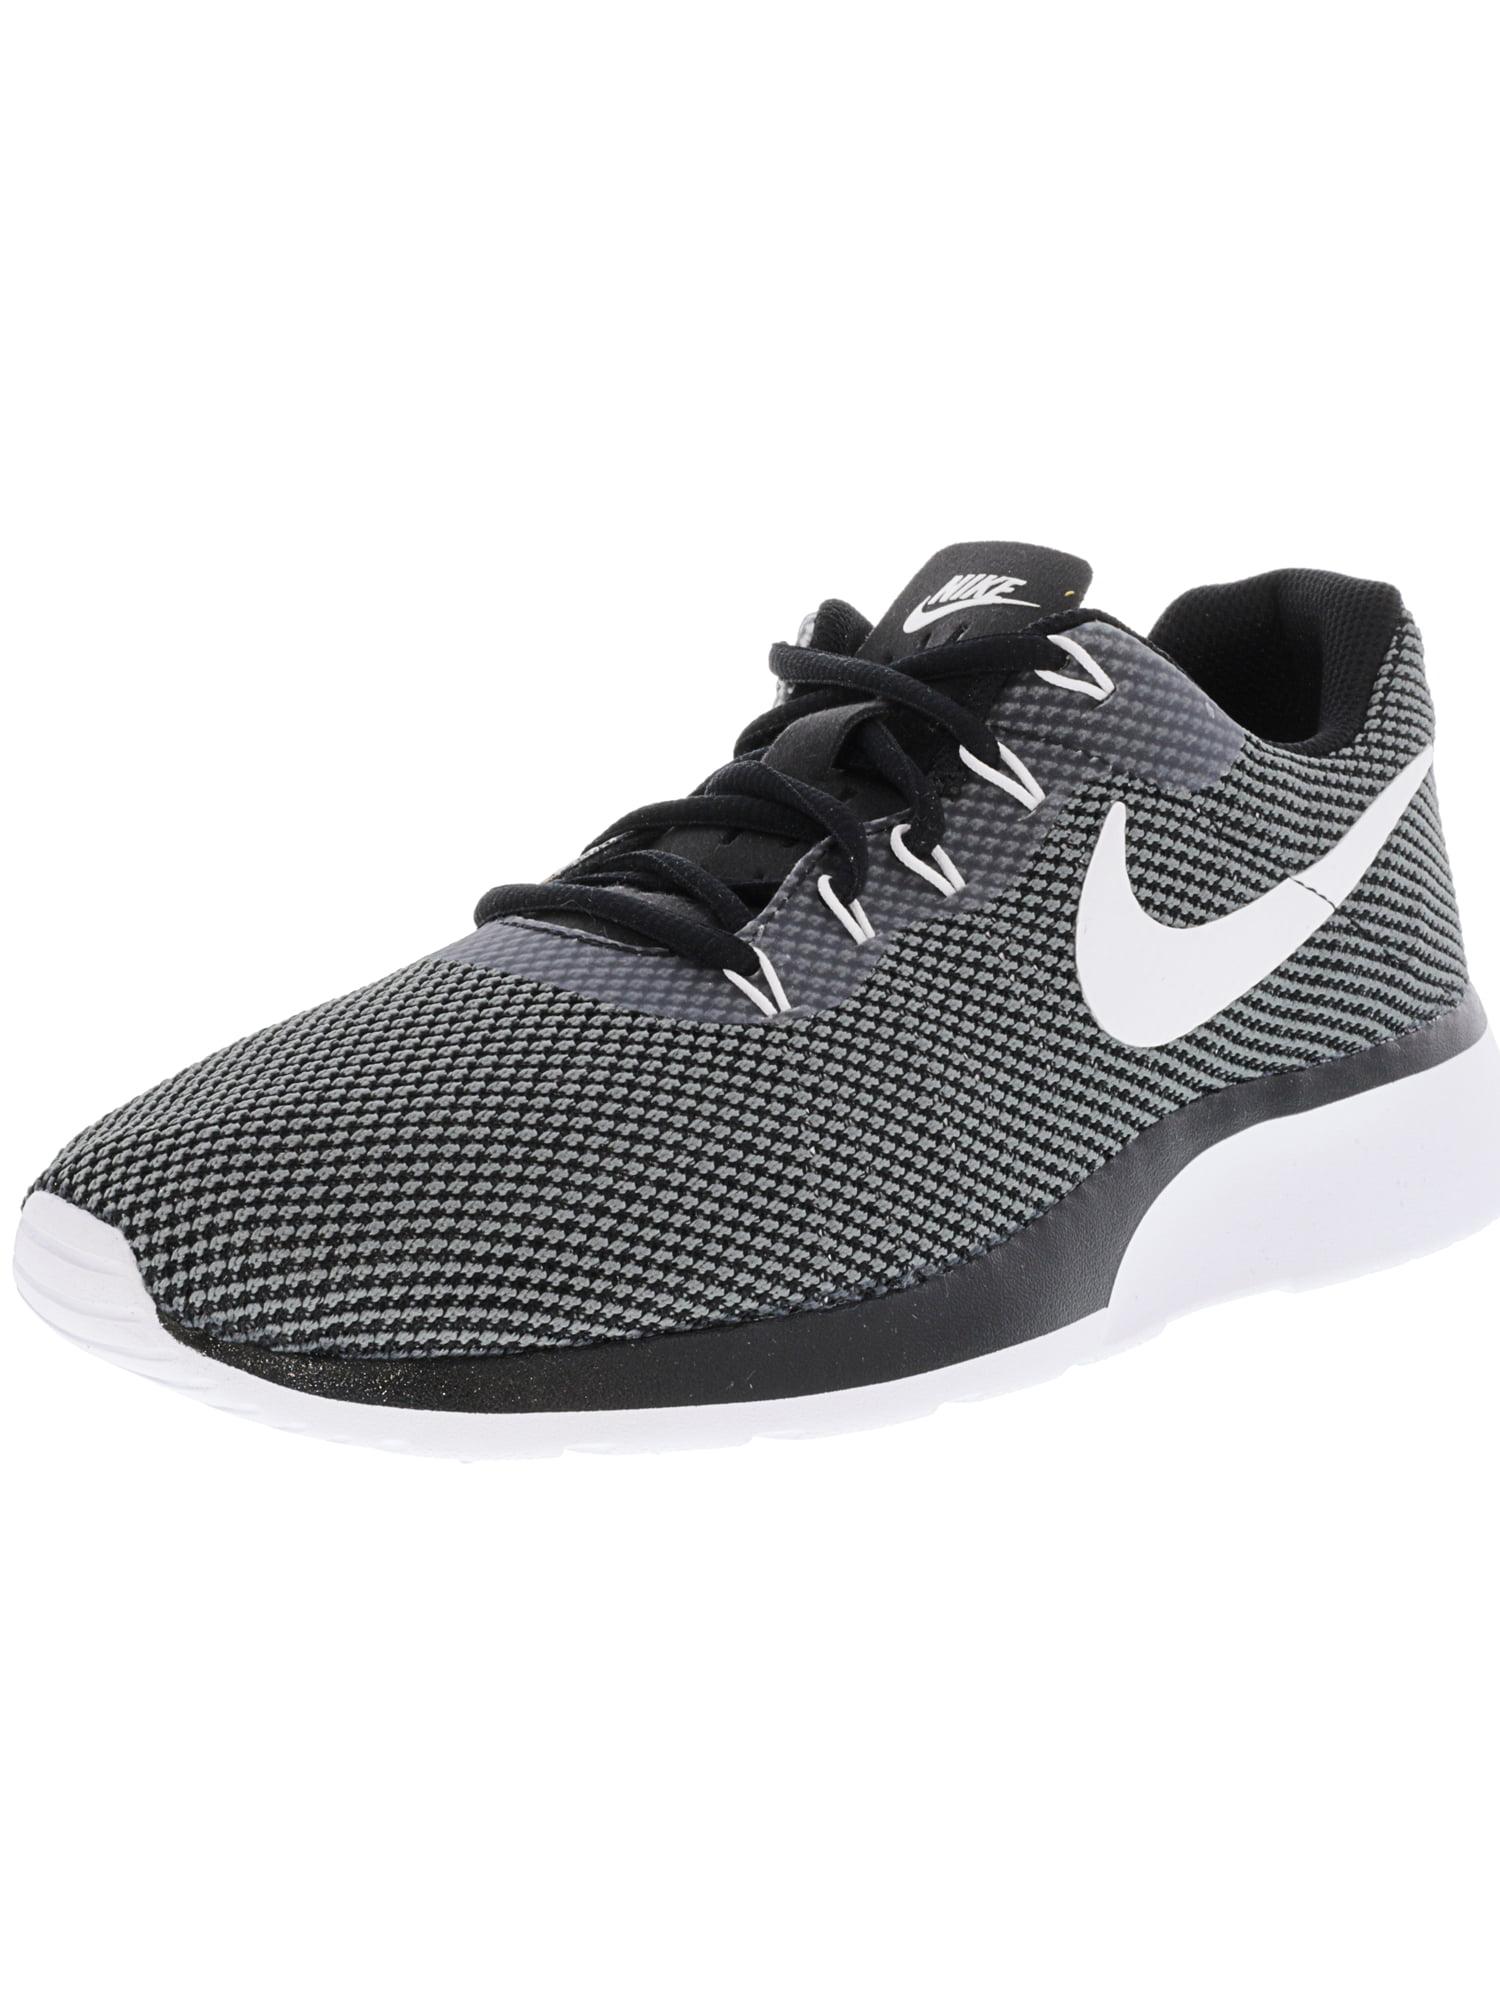 f9675b37d015 Nike Men s Tanjun Racer Dark Grey   White-Black Ankle-High Running Shoe -  11.5M